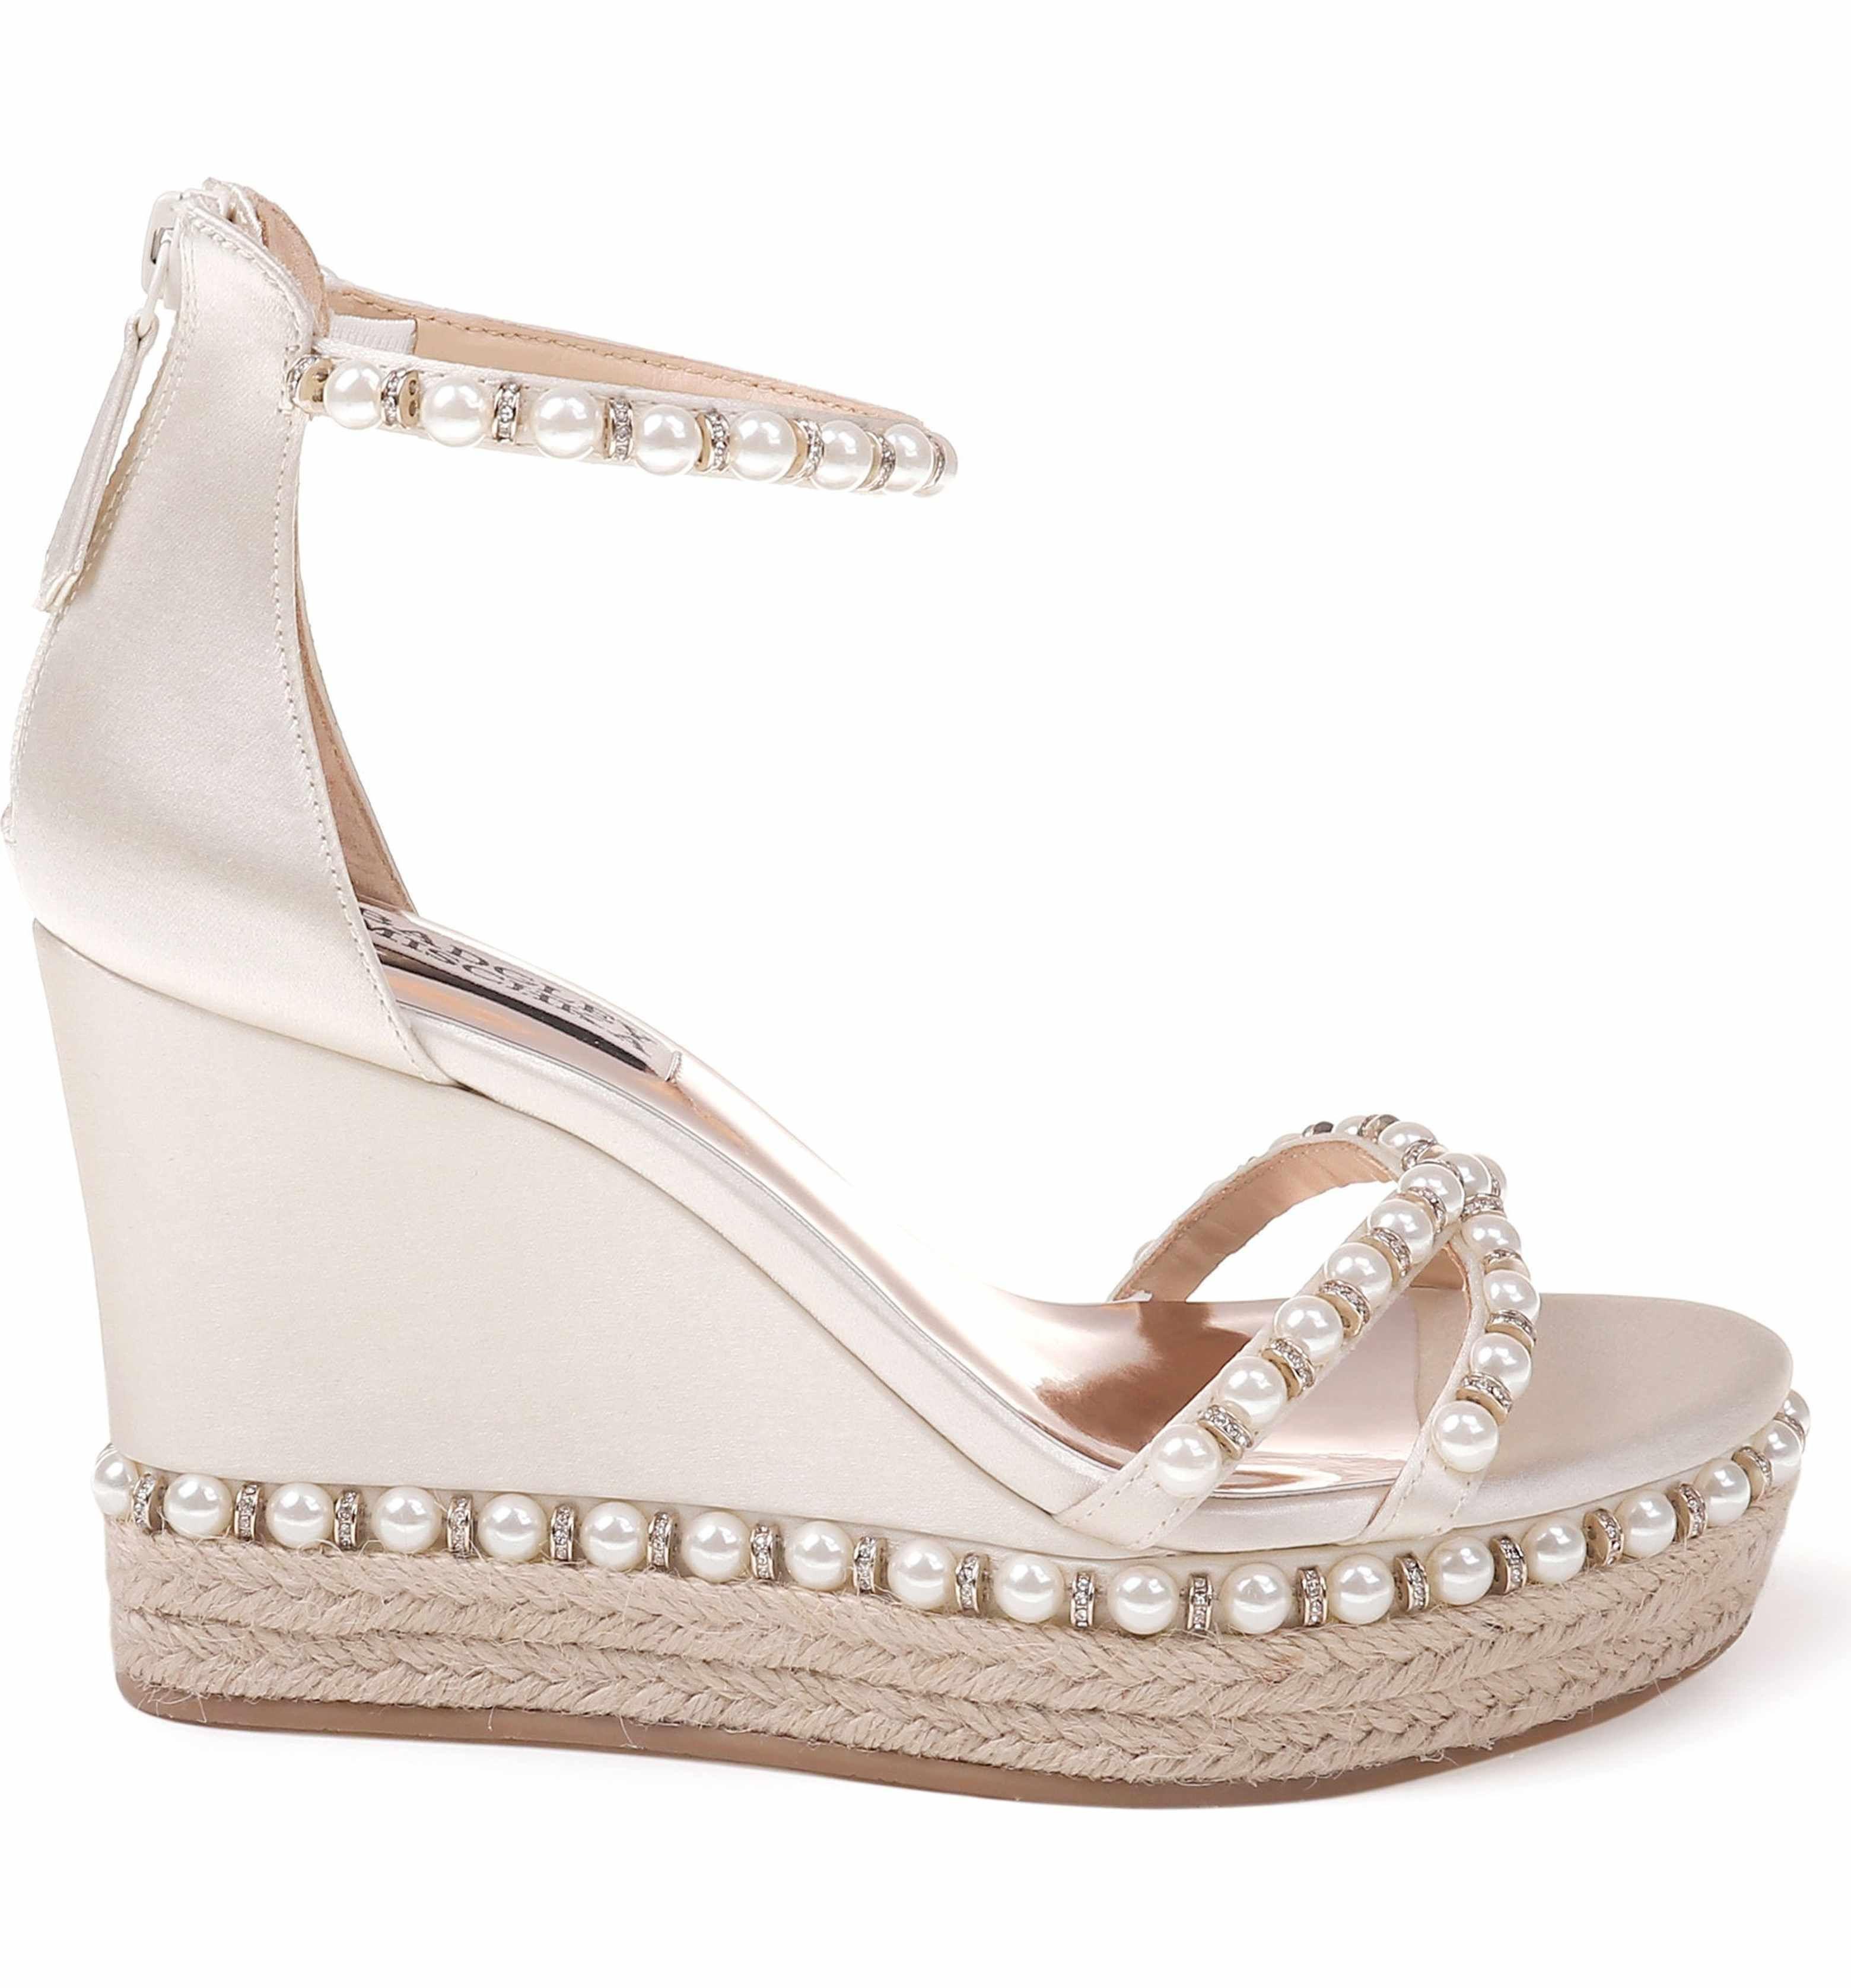 28cd67173b7 Main Image - Badgley Mischka Sloan Wedge Sandal (Women) | SHOES ...